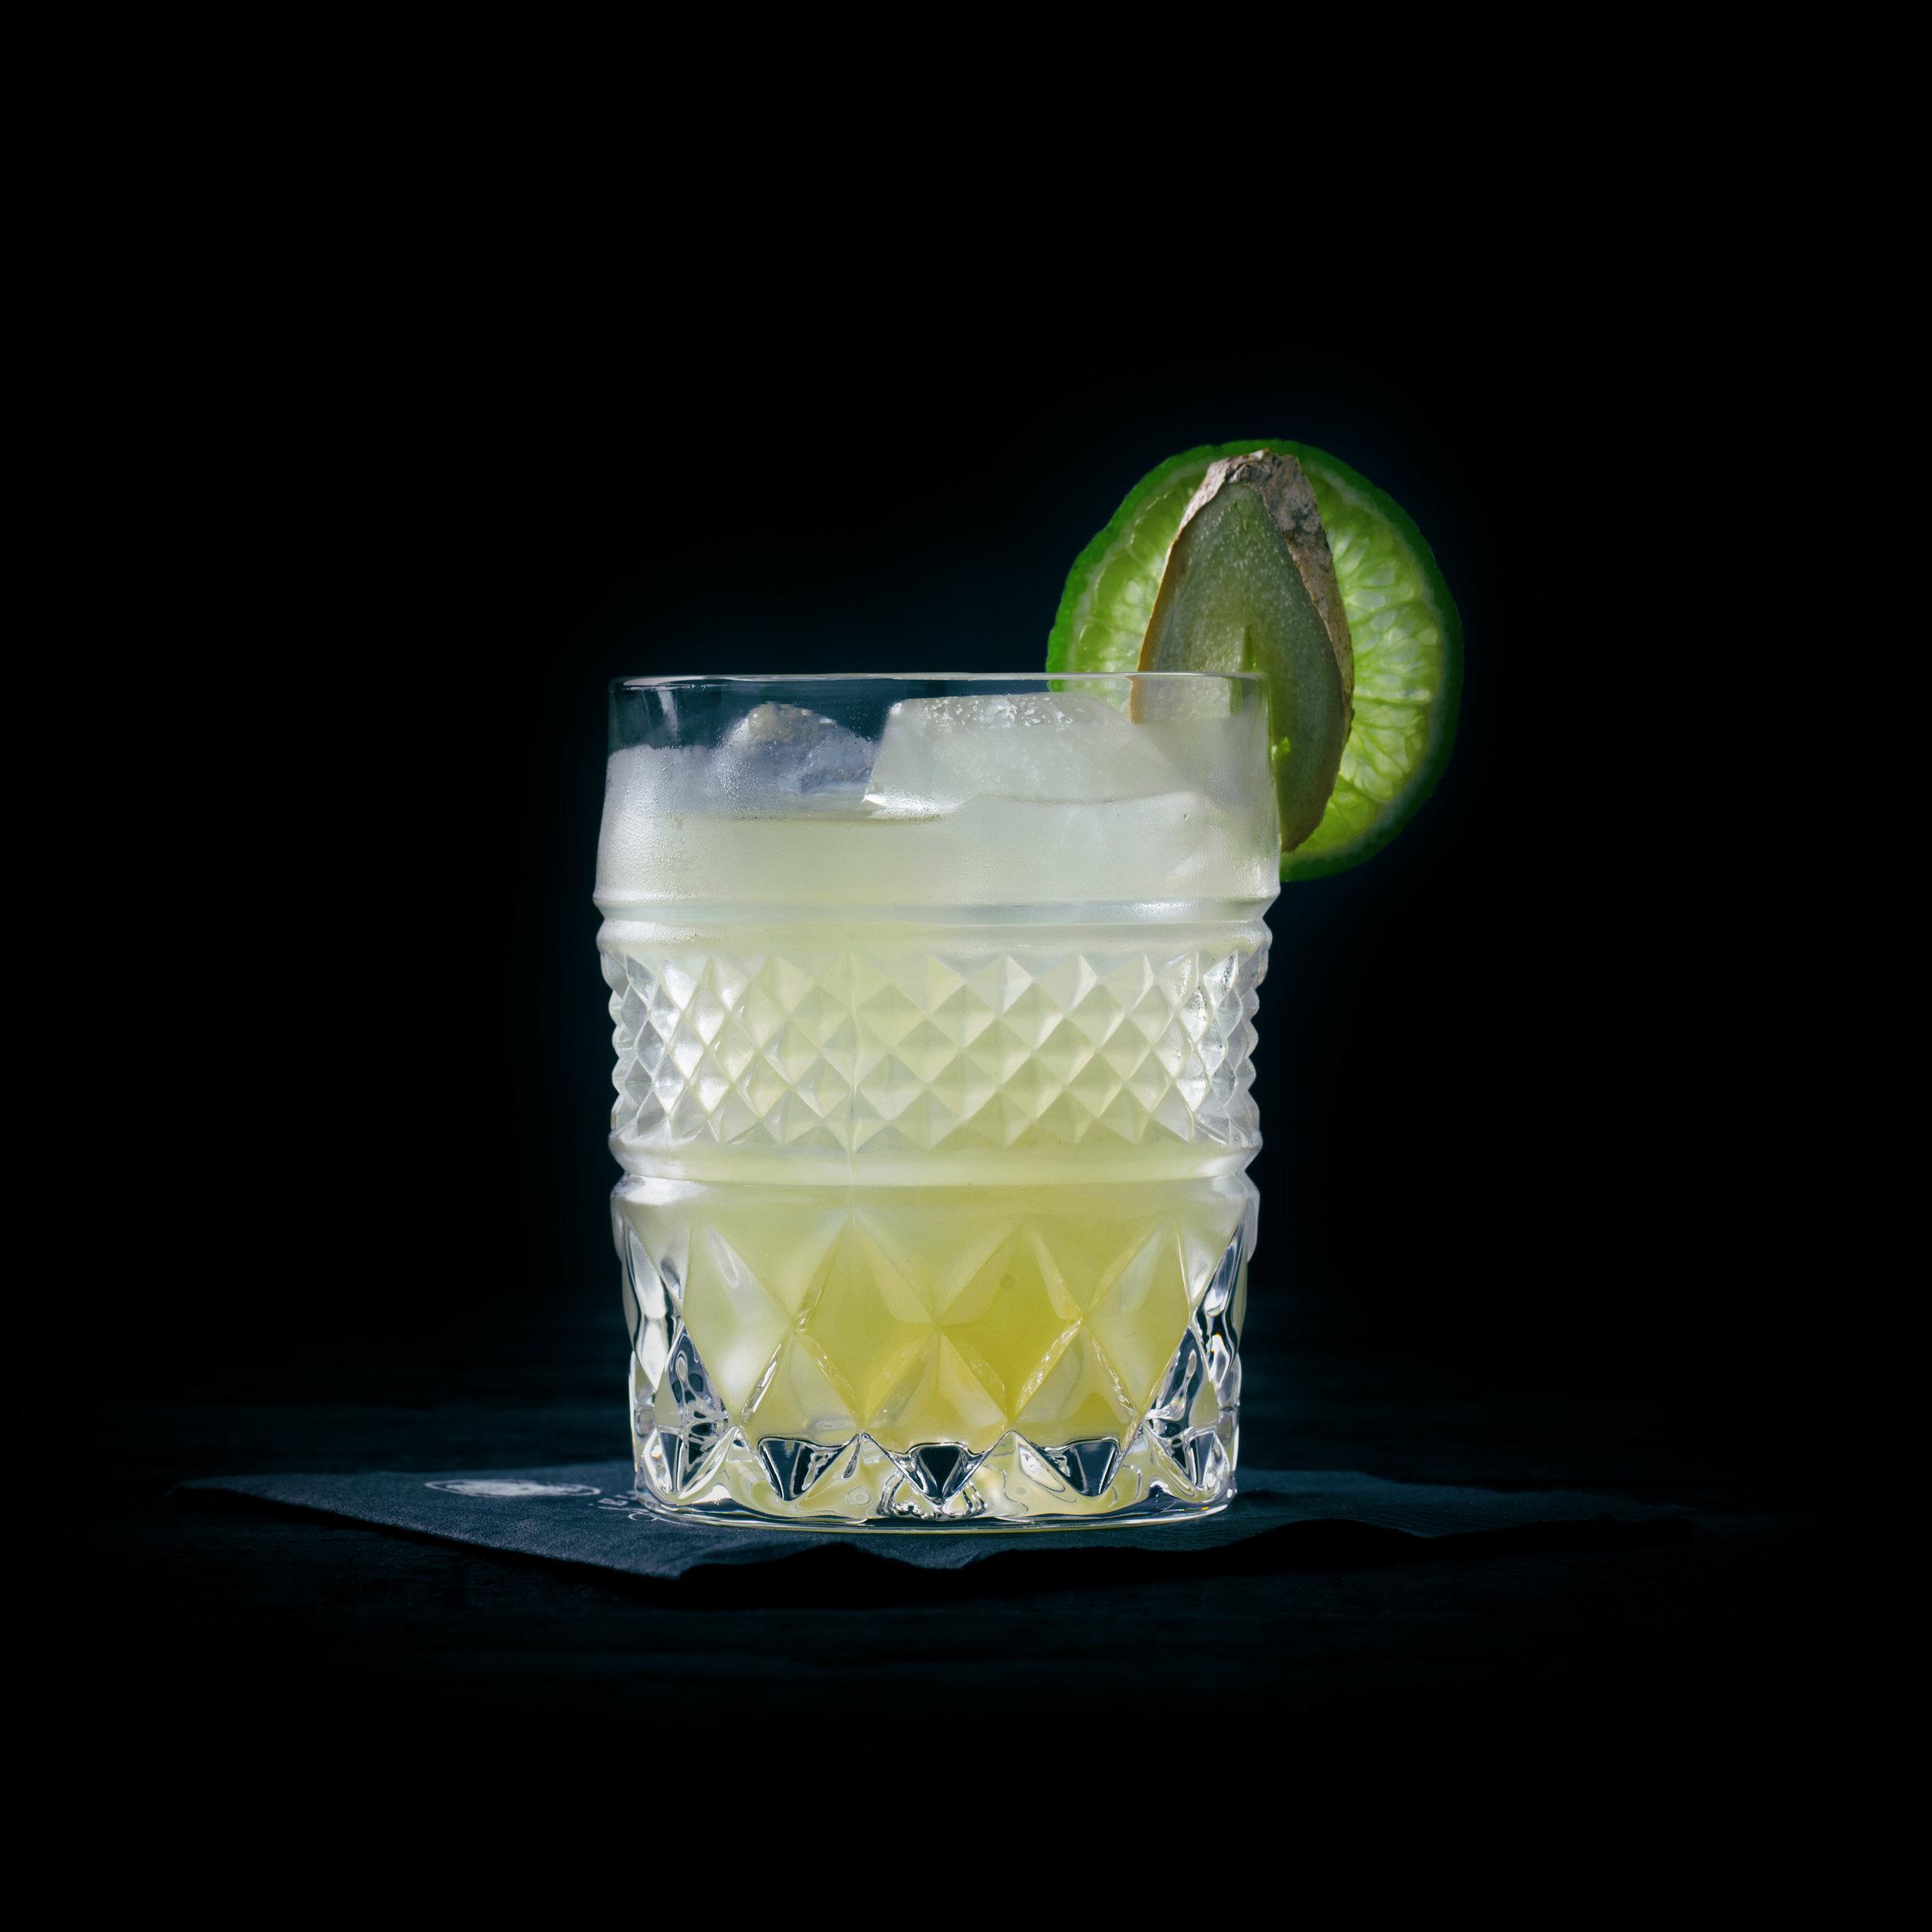 GINGER ME SOFTLY  INGREDIENTS  - 1.5 oz. El Silencio Espadin - 1 oz. Fresh Lime Juice - 1/2 Cucumber - Fresh Ginger  METHOD  Muddle cucumber and Ginger - Add additional ingredients Shake with ice & strain Garnish: Lime Wheel & Ginger